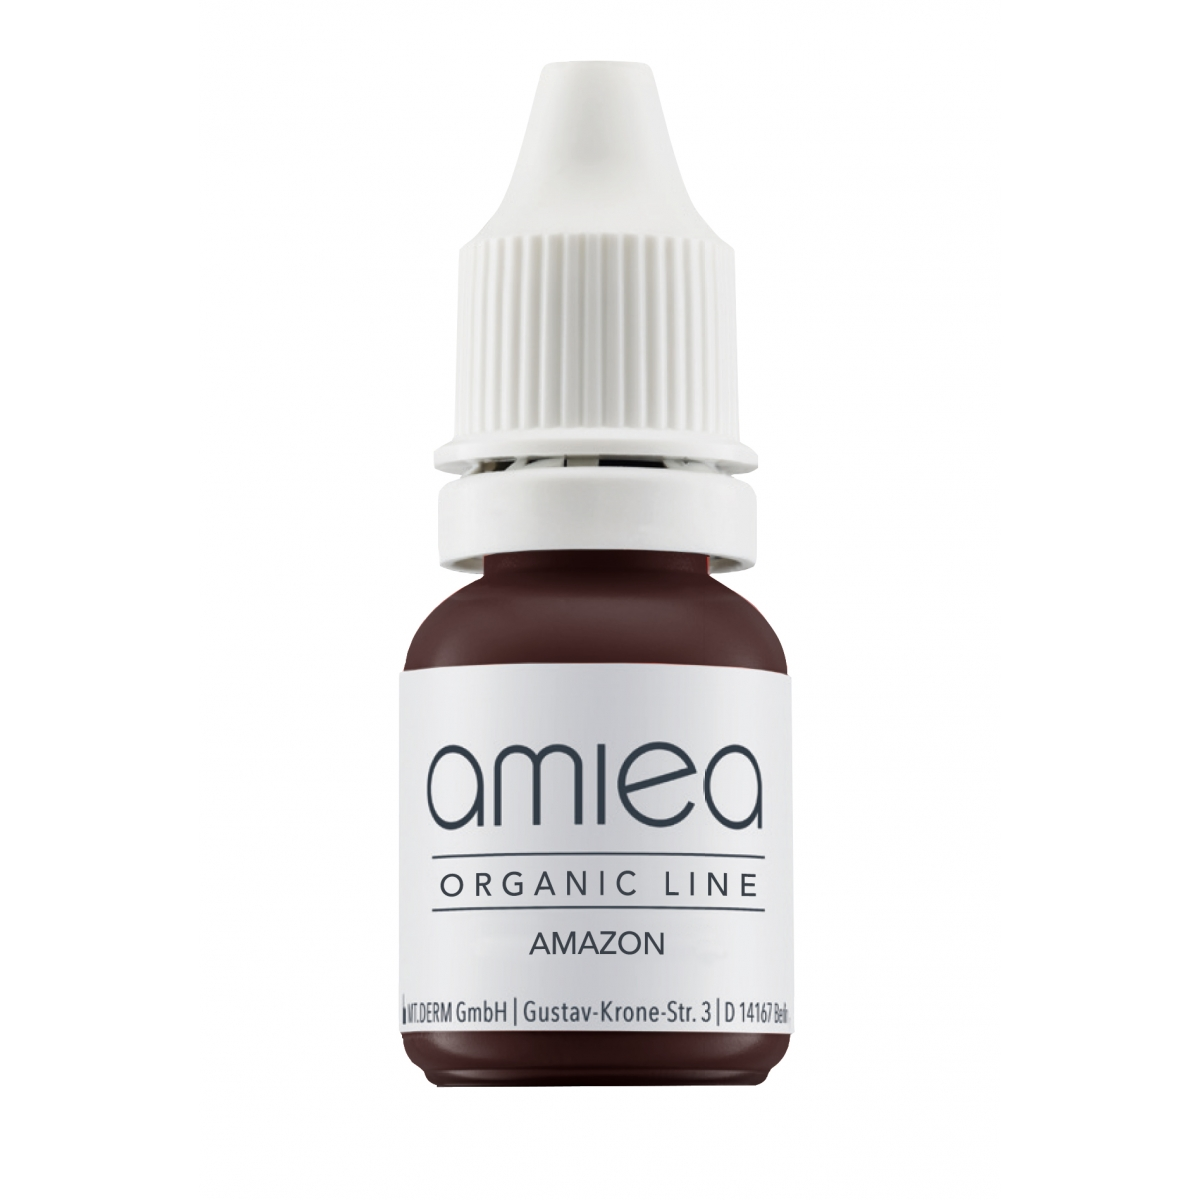 ORGANIC LINE (10ml) - PIGMENT AMAZON ORGANICLINE AMIEA (10 ml)